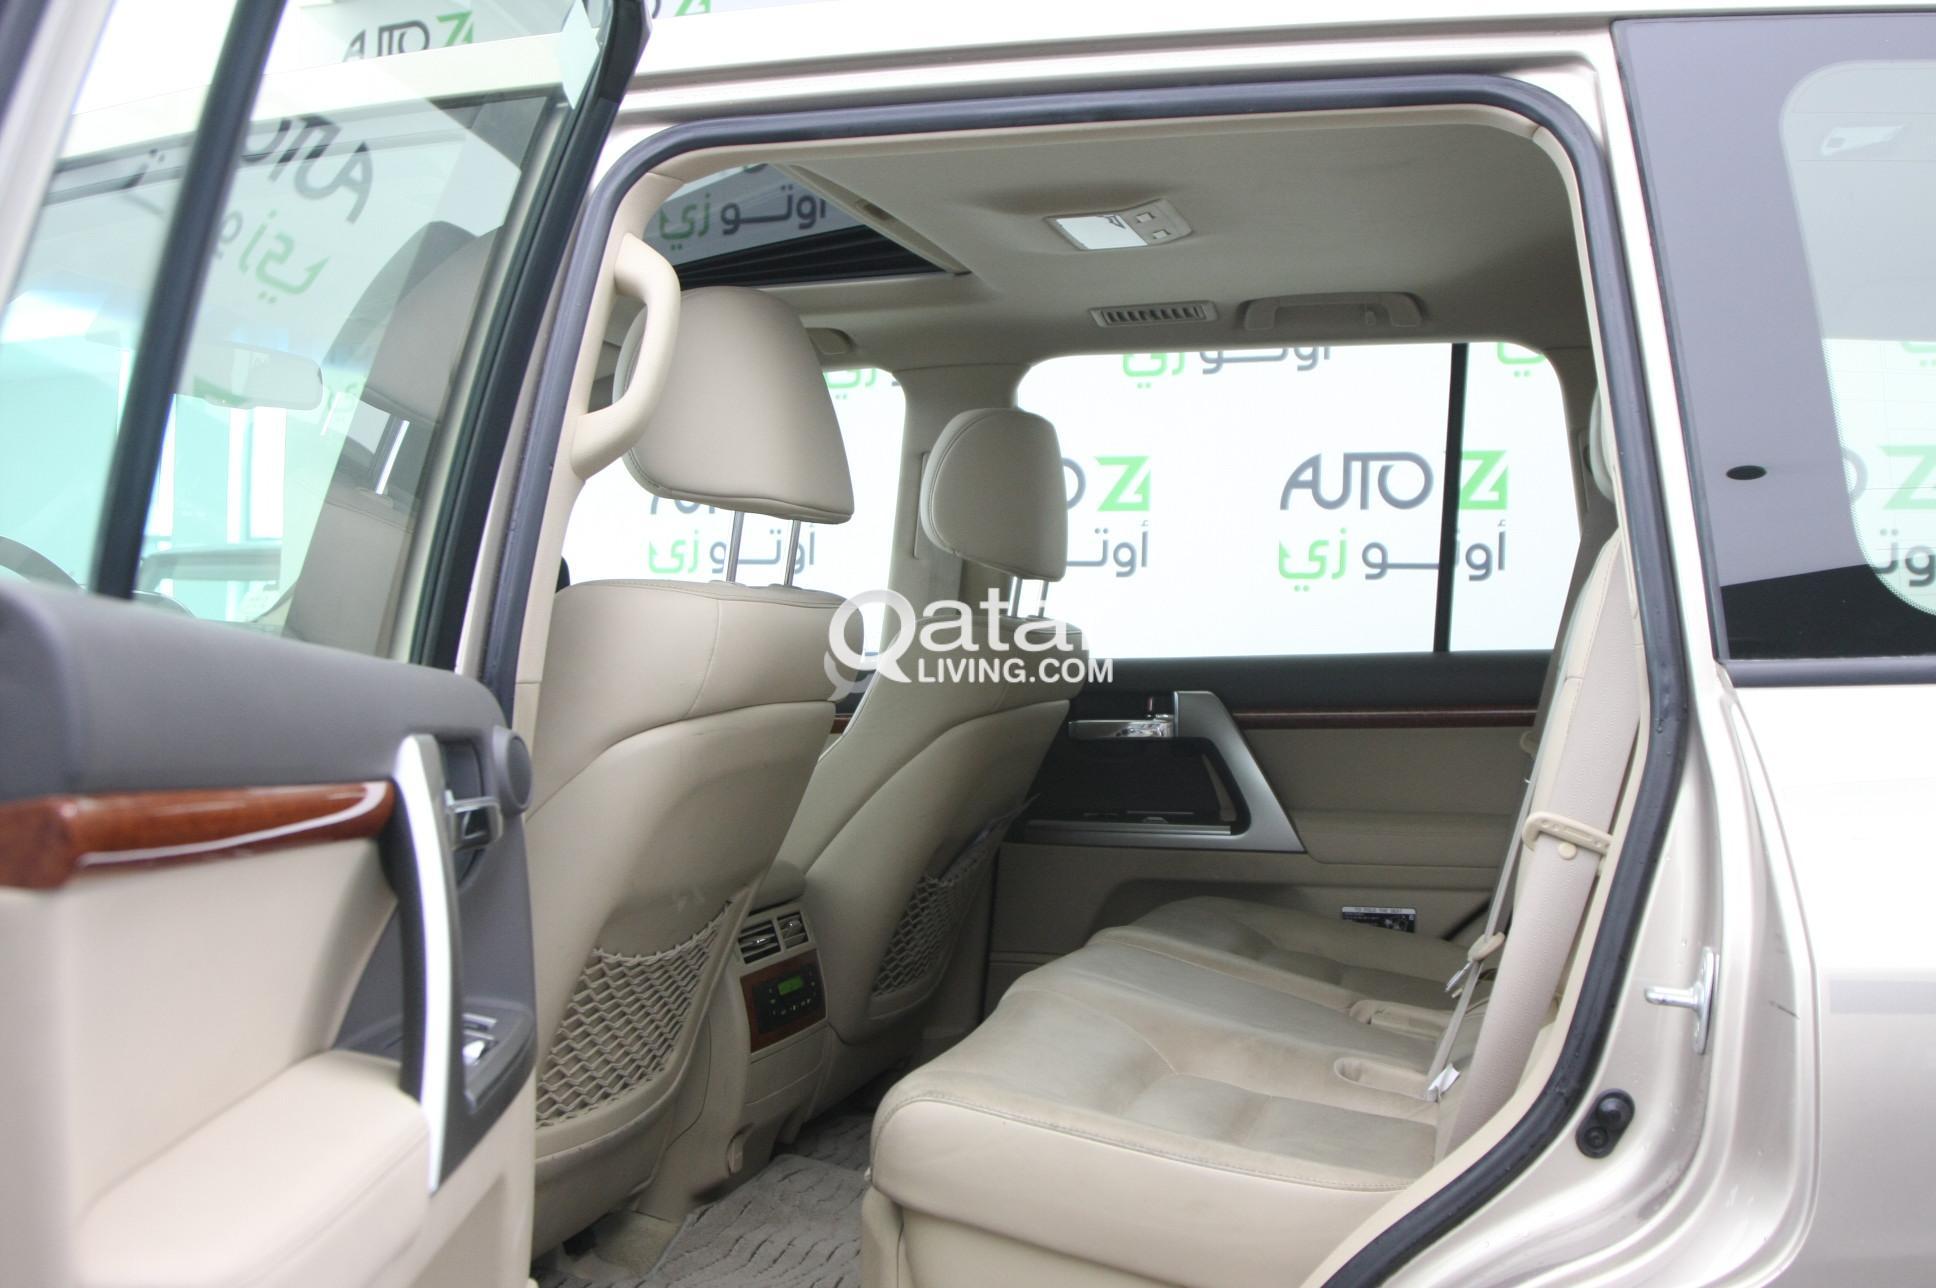 Toyota Land Cruiser VXR 2013   Qatar Living